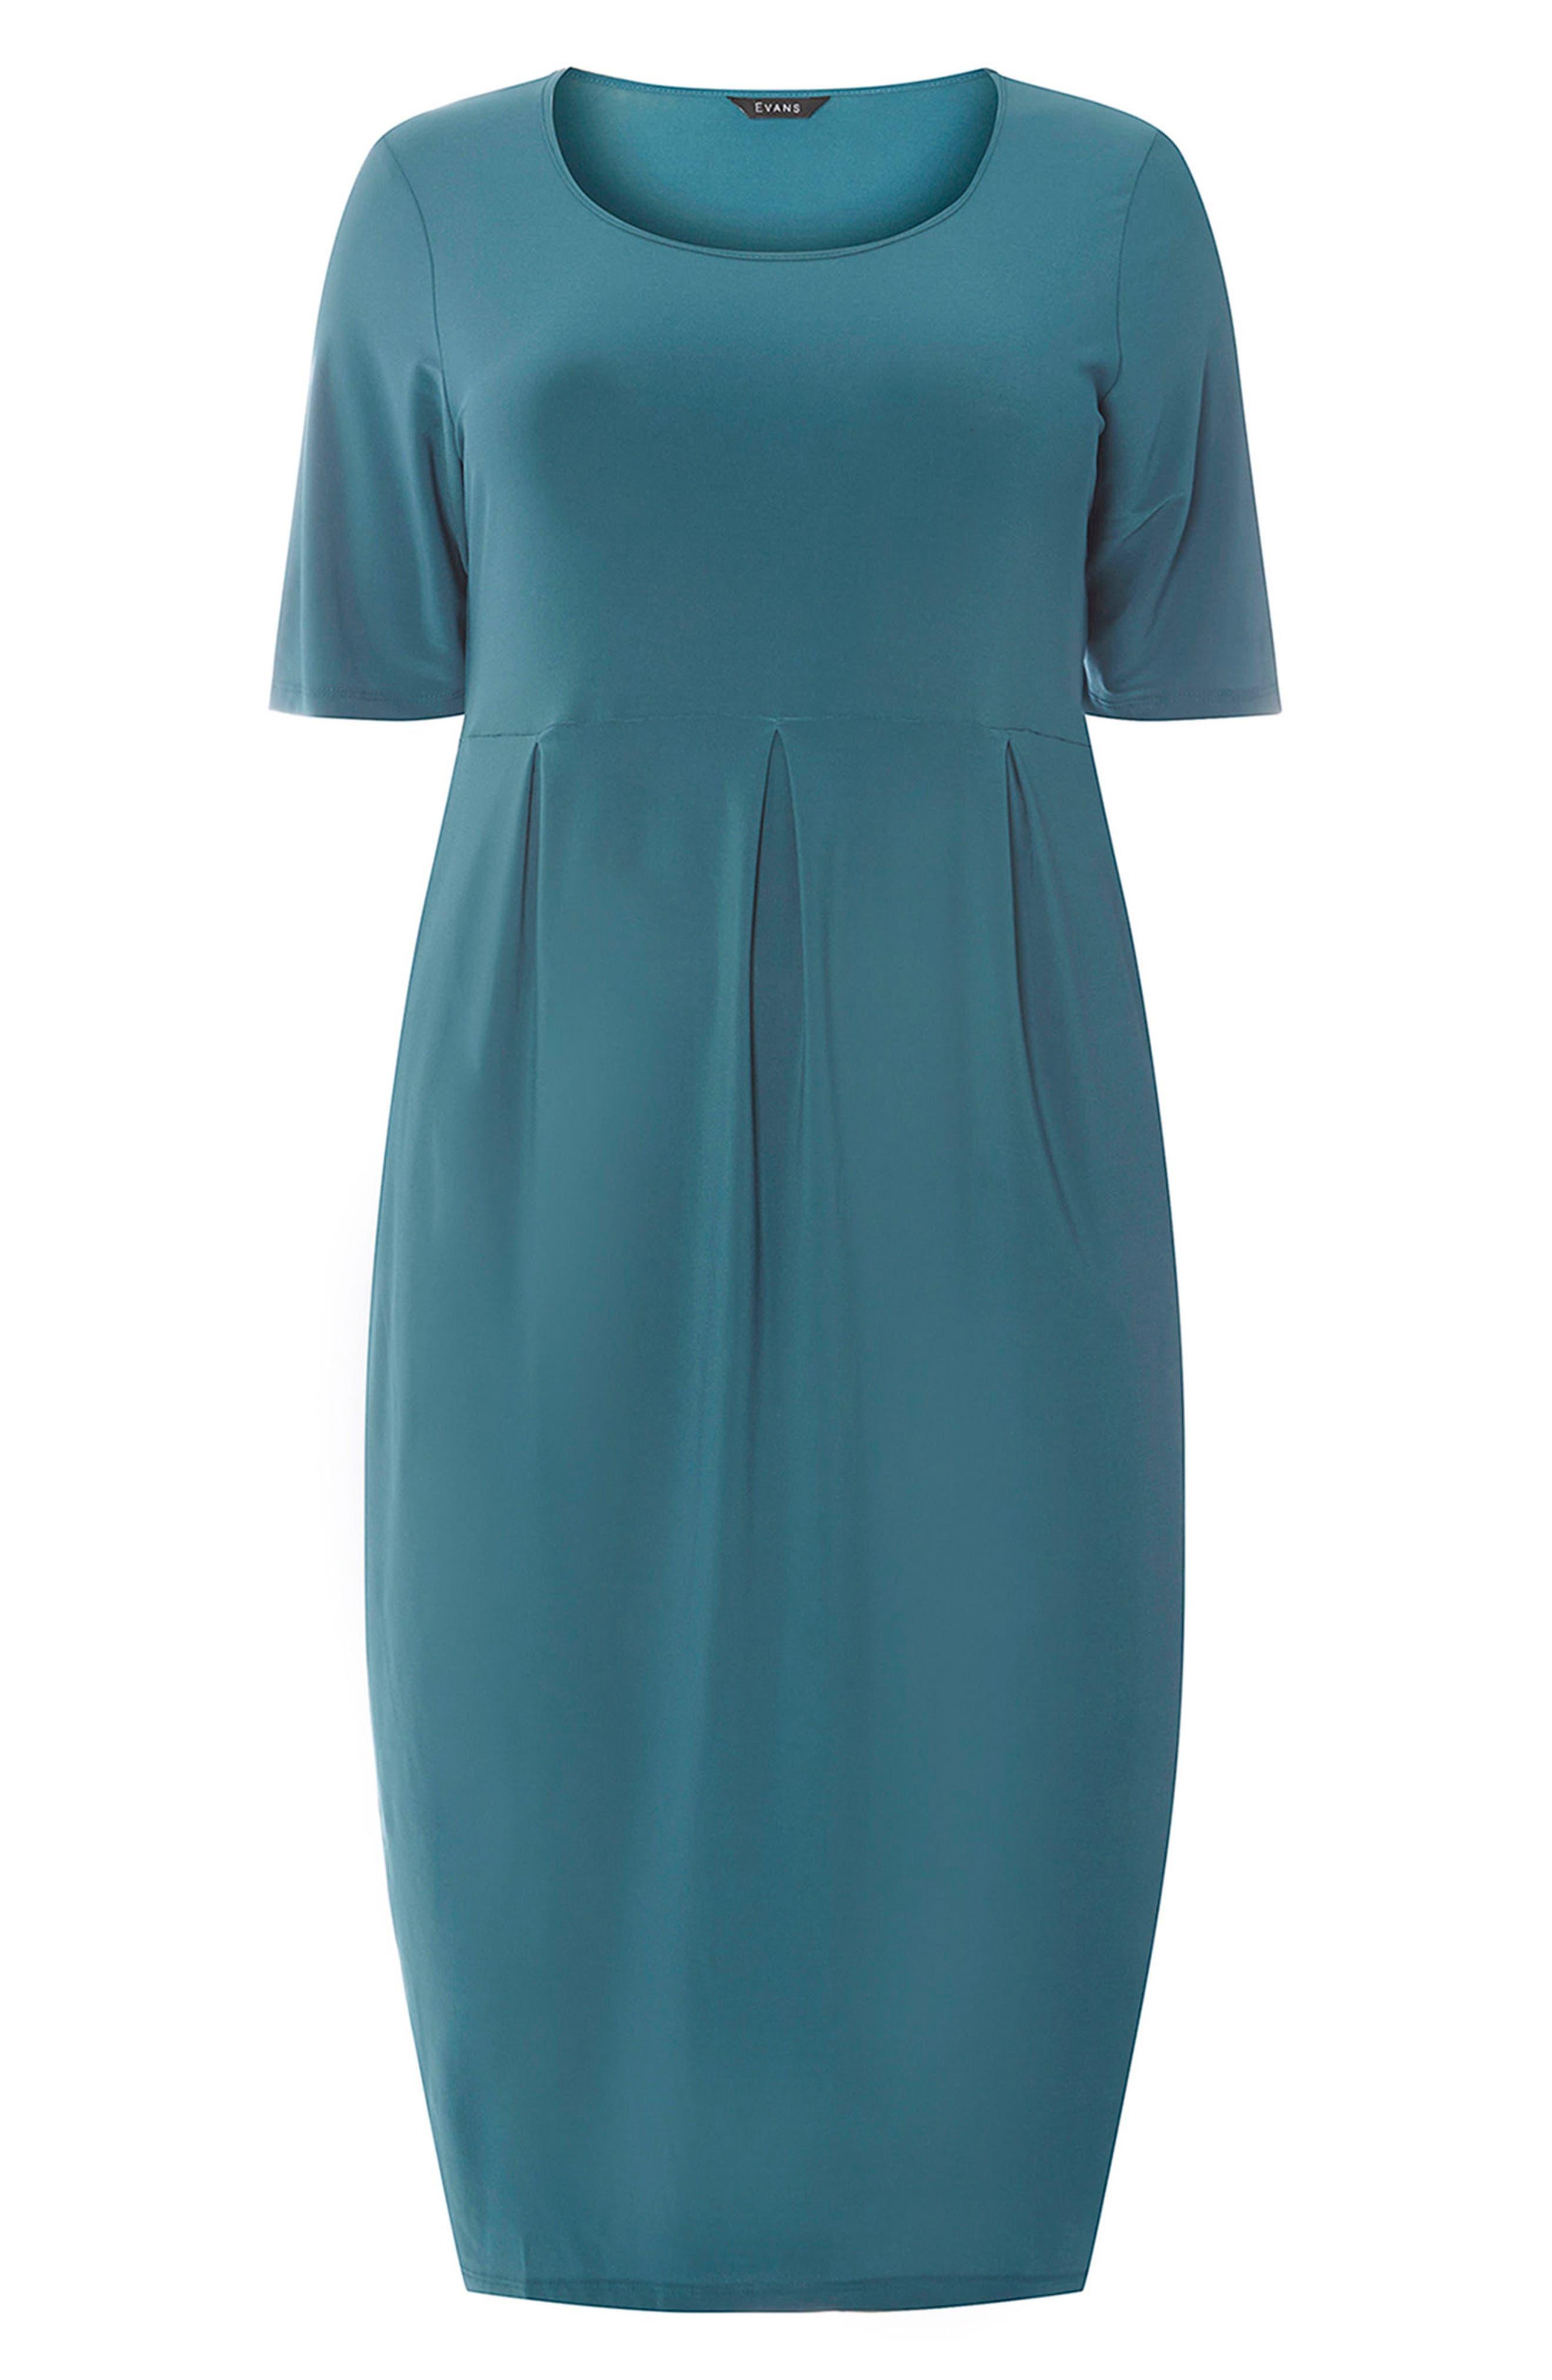 Pocket Dress,                             Alternate thumbnail 5, color,                             Green